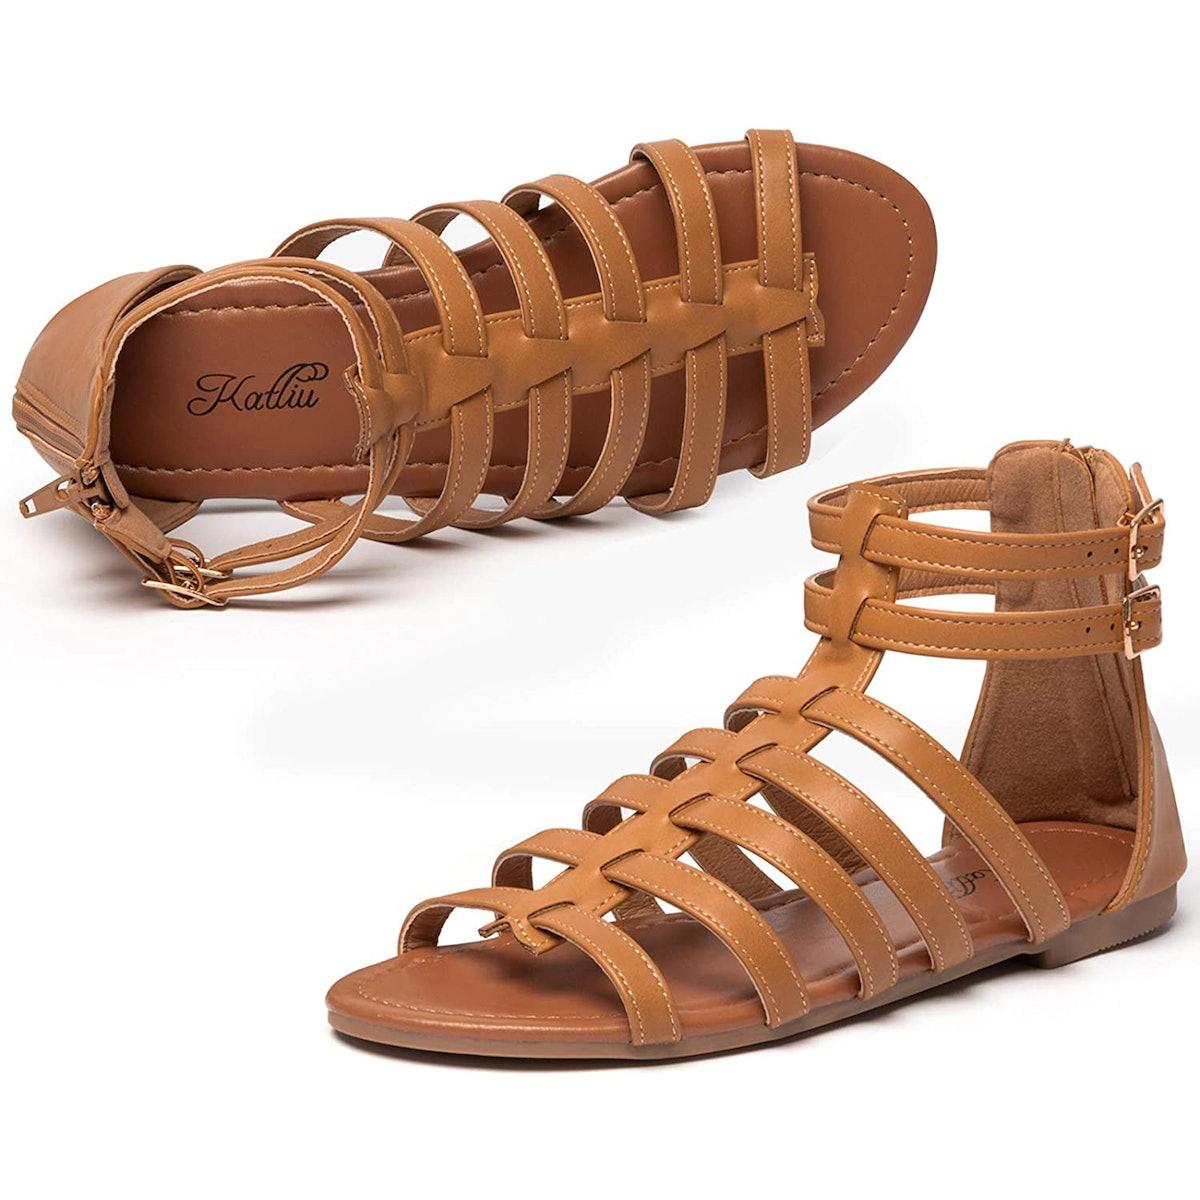 katliu Flat Gladiator Sandals